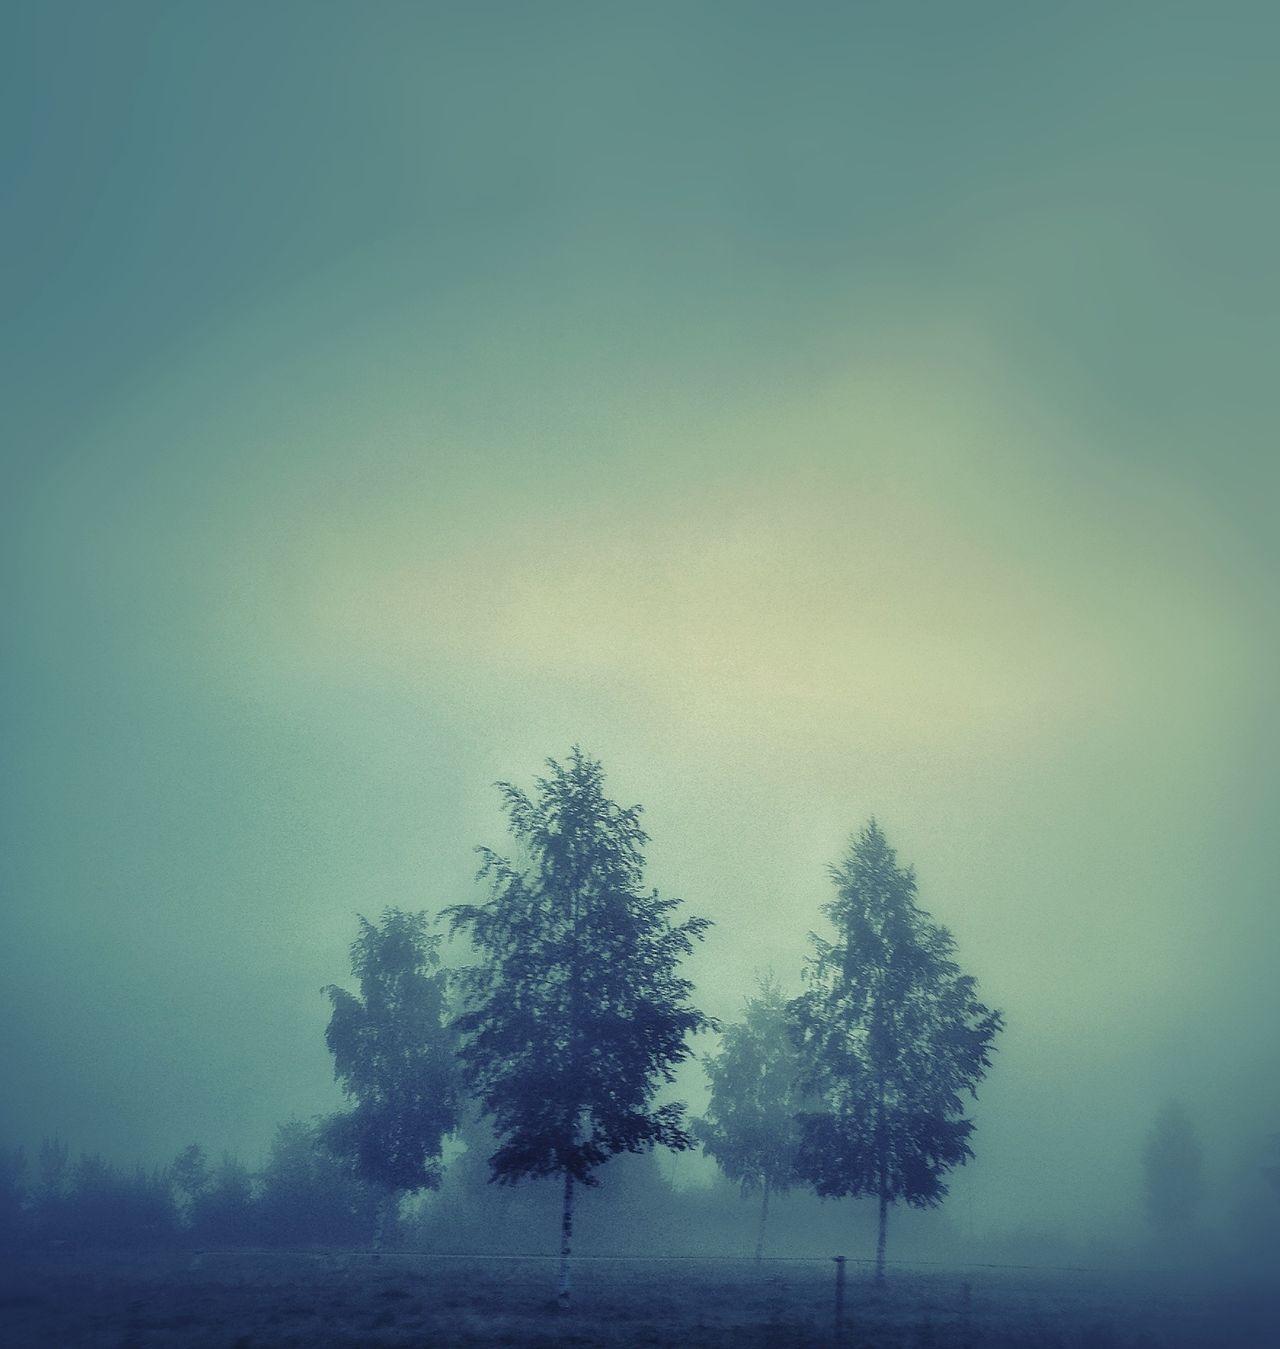 EyeEm Nature Lover EyeEm Best Shots - Landscape On The Road ! EyeEm Best Shots - Trees